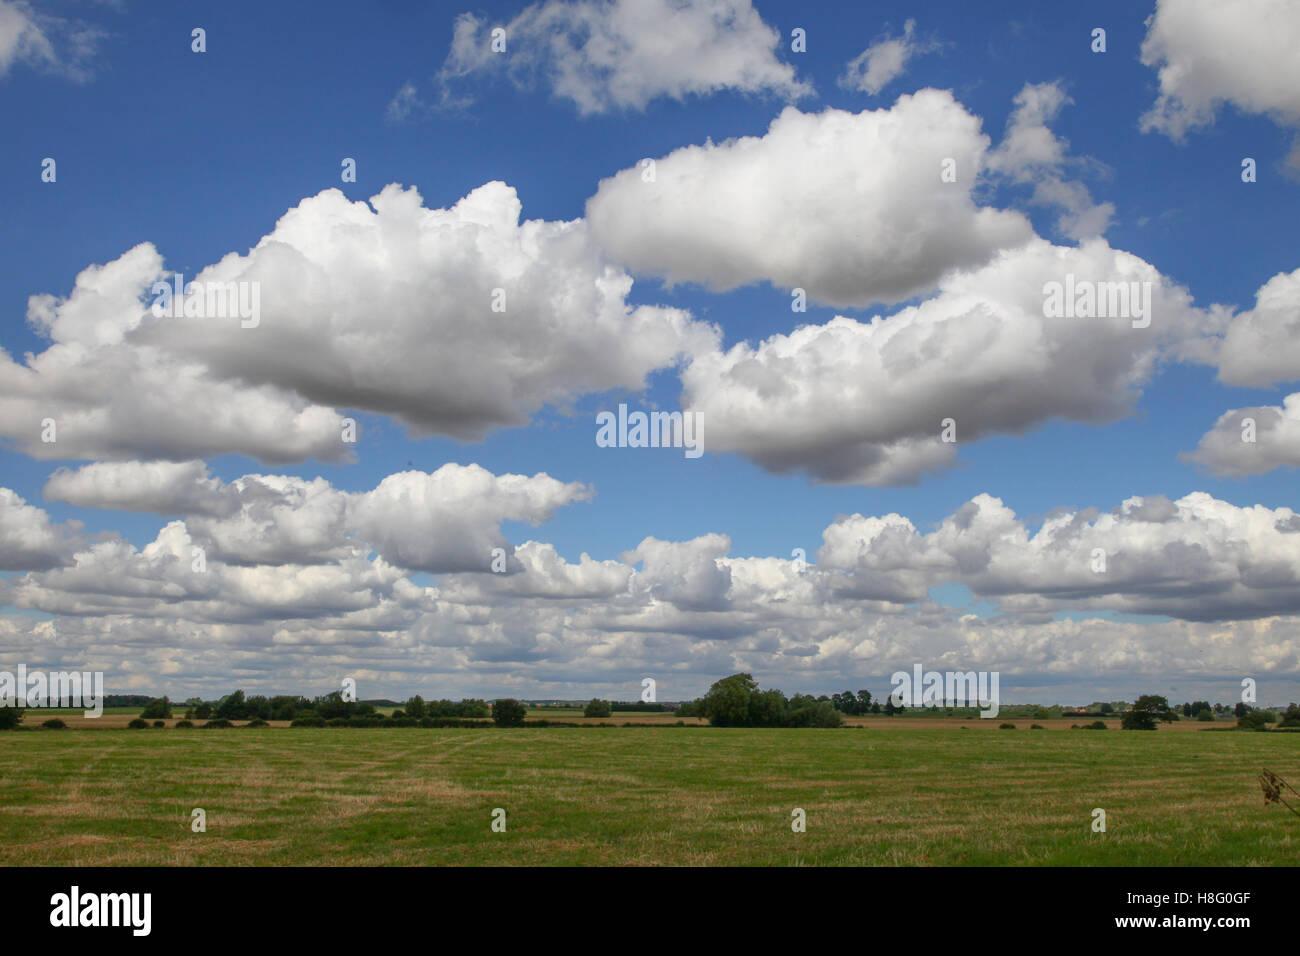 Lincolnshire Big Sky, big, travel, landmark, blue, tourism, view, beautiful, sunset, day, famous, art, white, image, Stock Photo